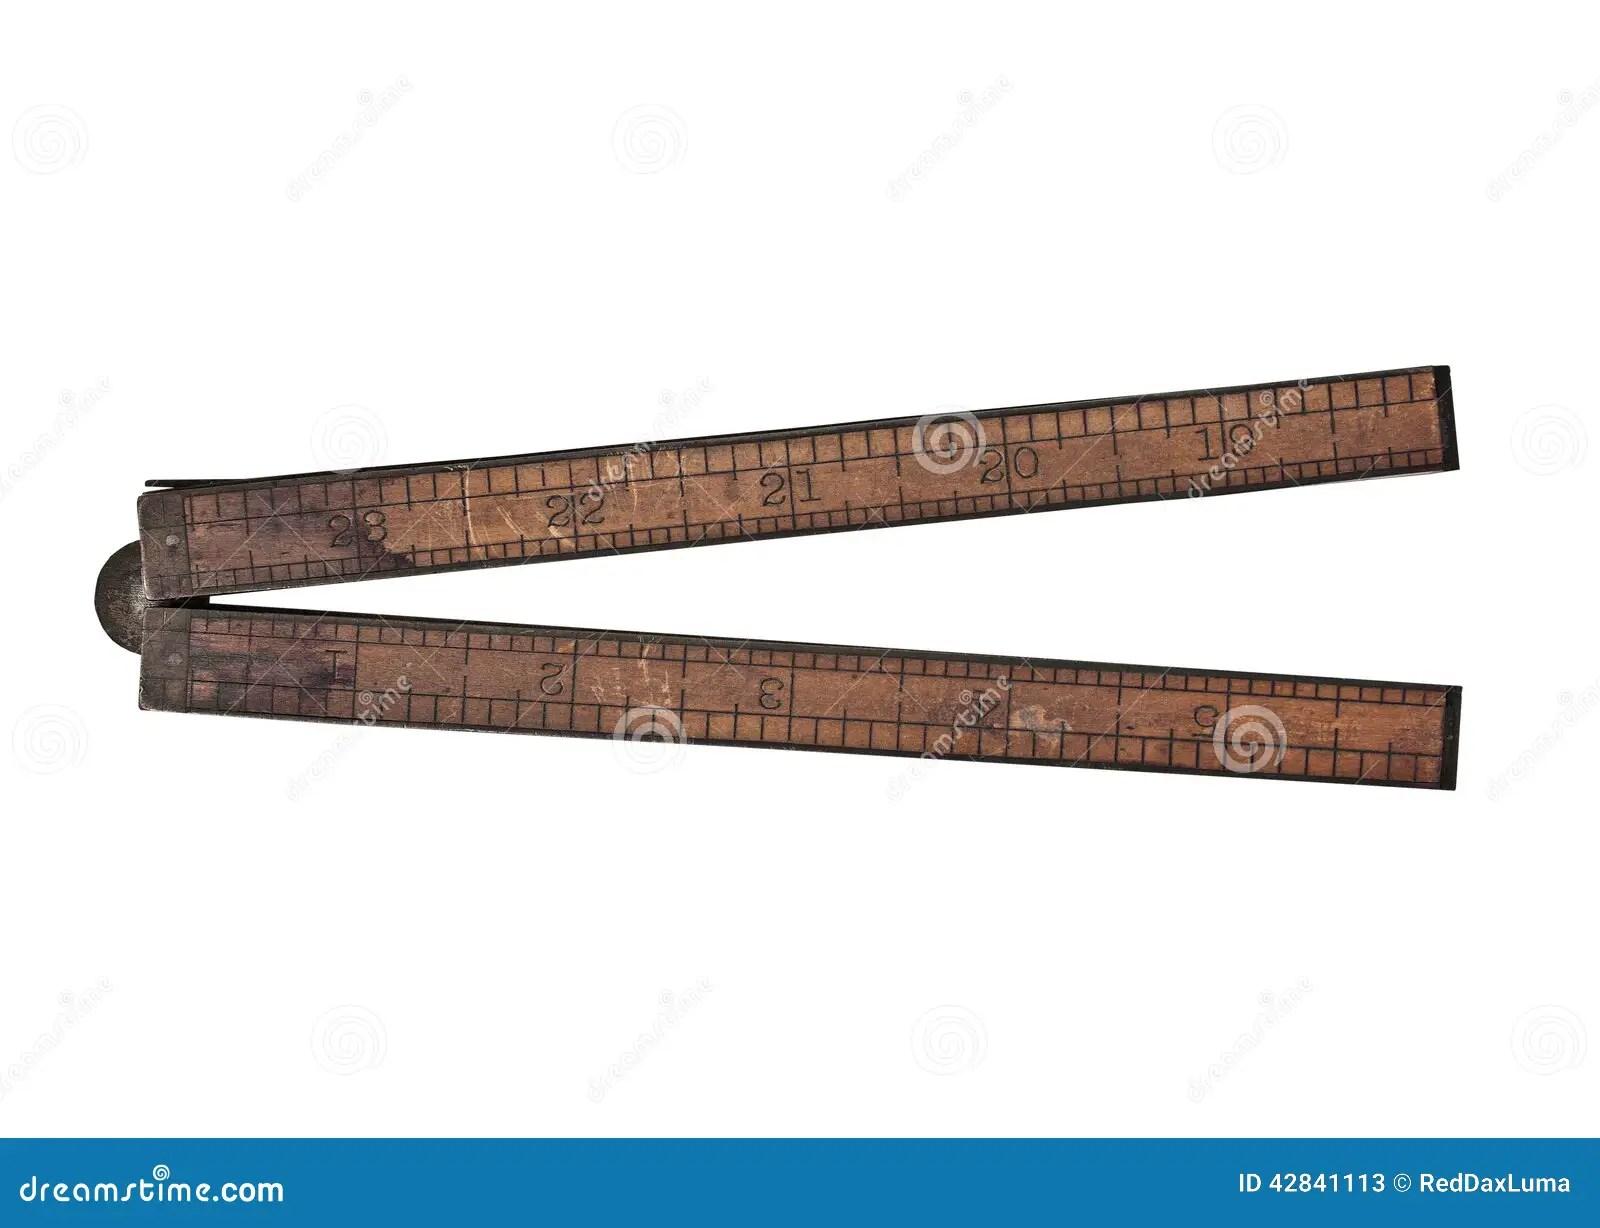 Vintage Wooden Ruler Stock Image Image Of Single Length 42841113